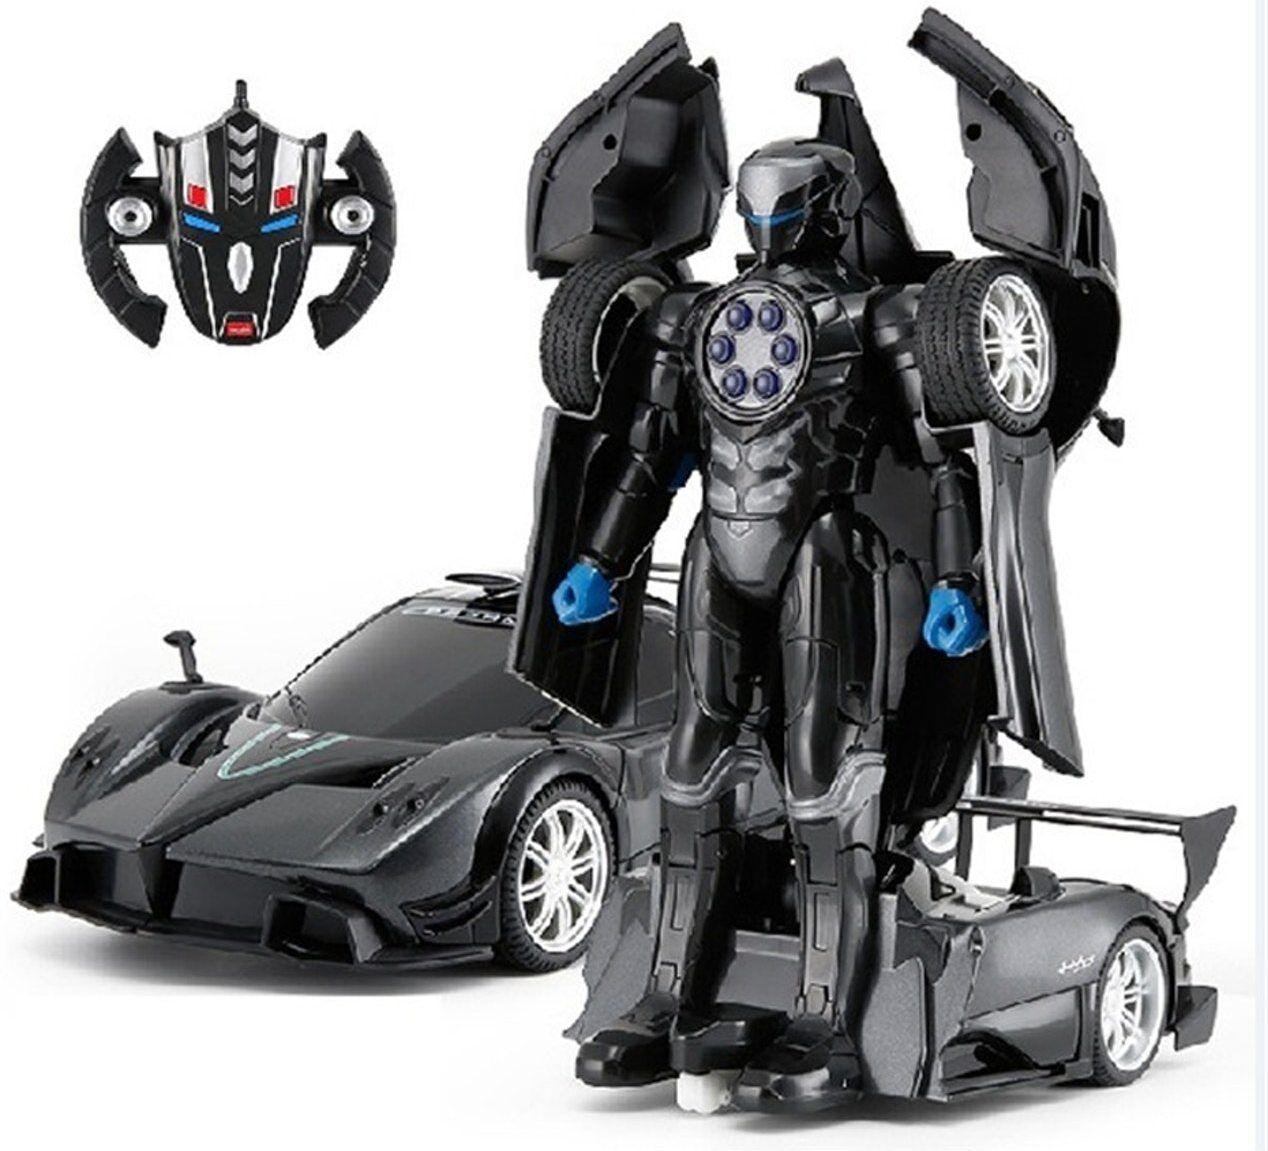 Radio Controlled Pagani Zonda R One-key Transforming Robot   Car 1 14 Rastar